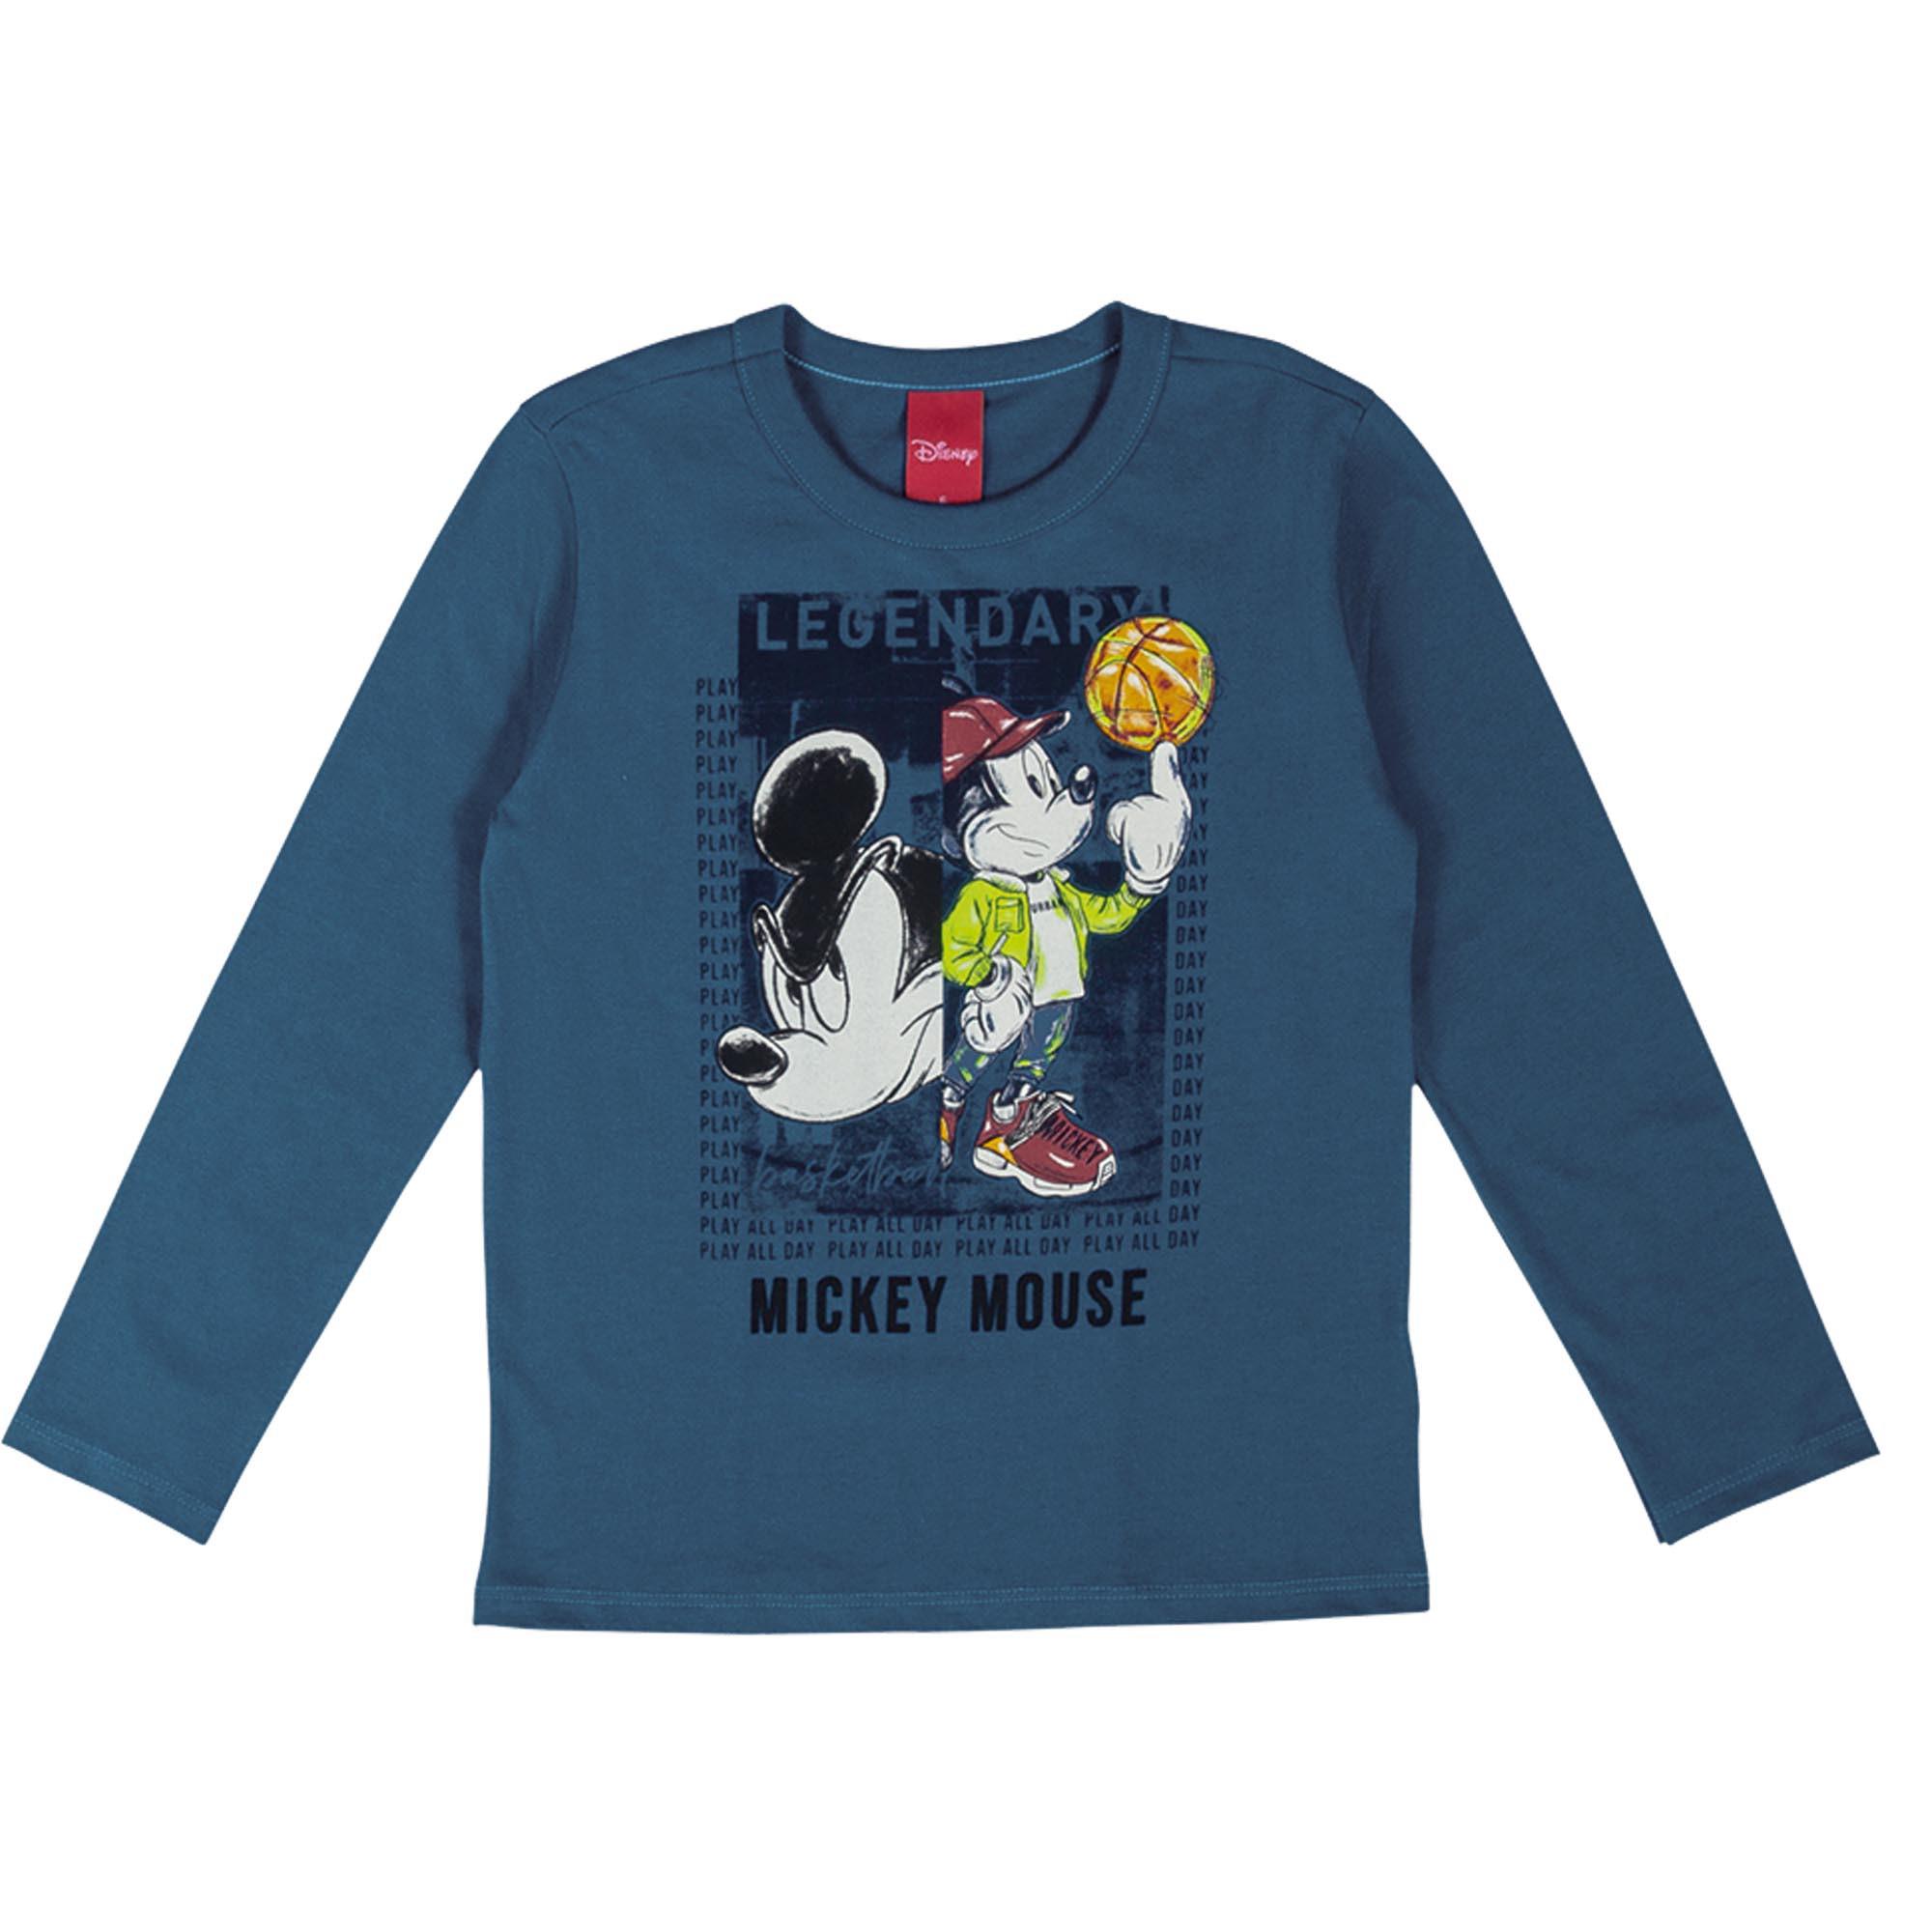 Camiseta Manga Longa Cativa Estampa com Neon Mickey Rodando Bola no Dedo - 4 ao 10